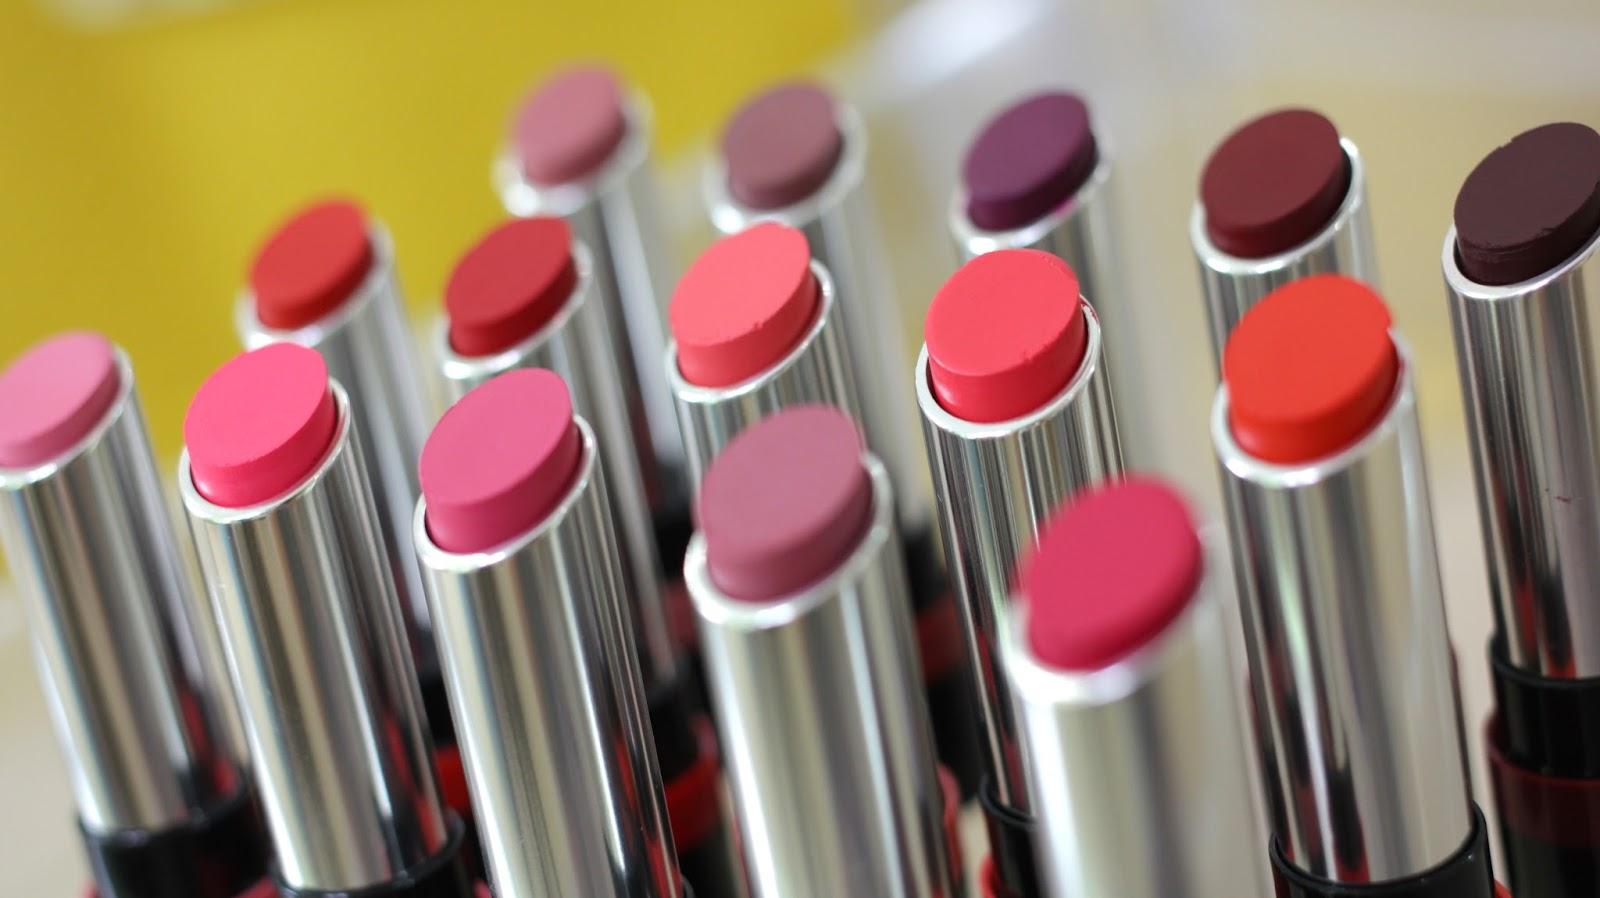 Rimmel 'The Only 1' Lipstick - Review & Swatches - Fleur De Force